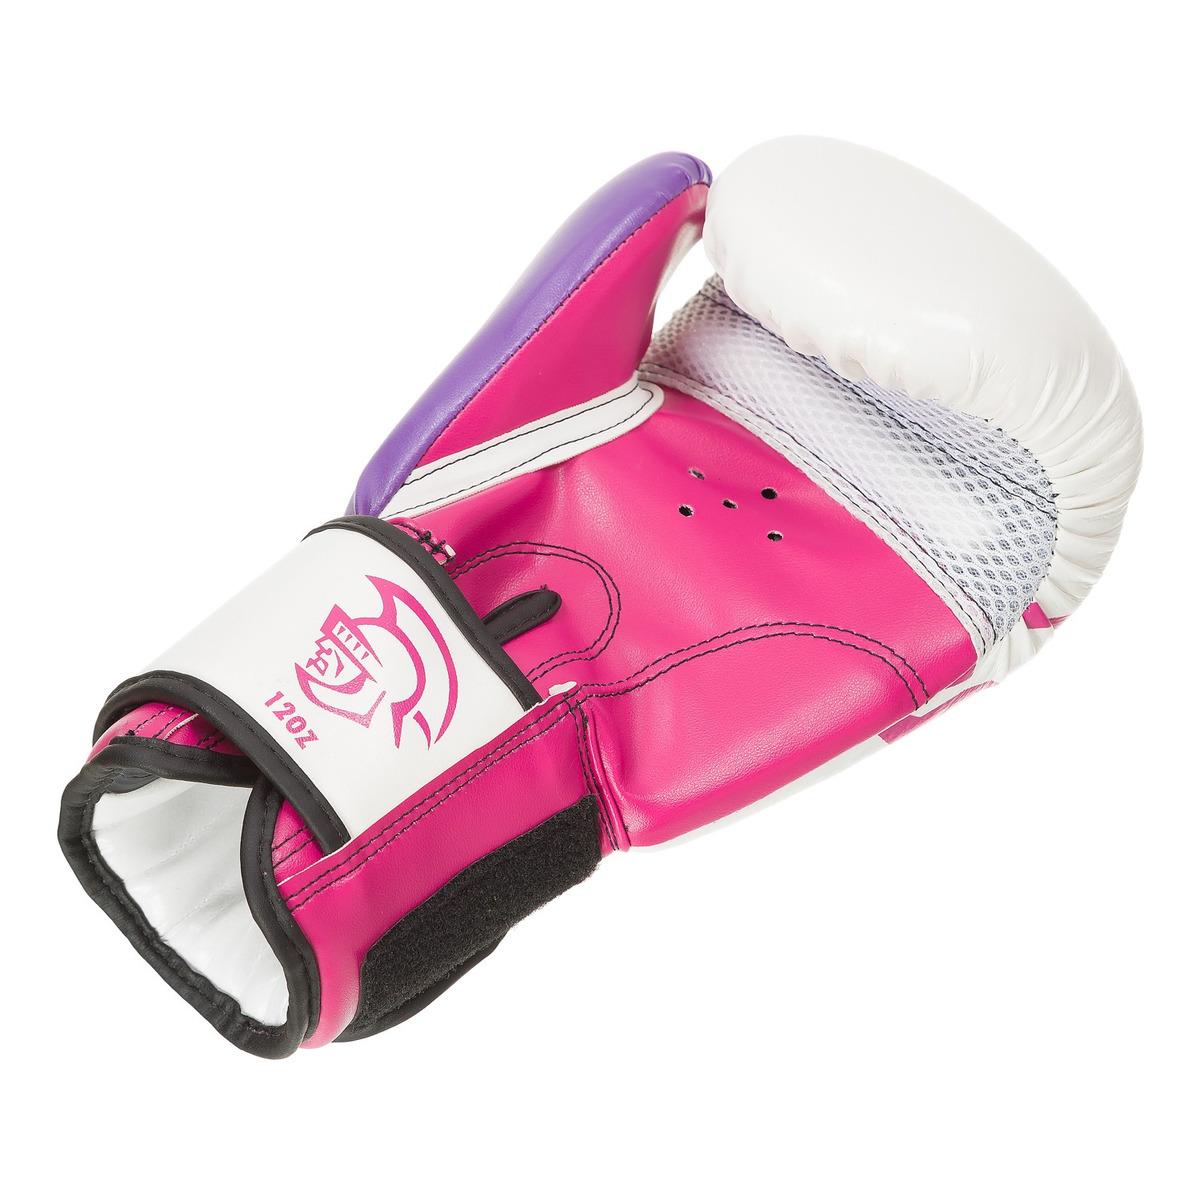 57fa1fd79 luva de boxe muay thai pretorian elite training 14oz rosa. Carregando zoom.